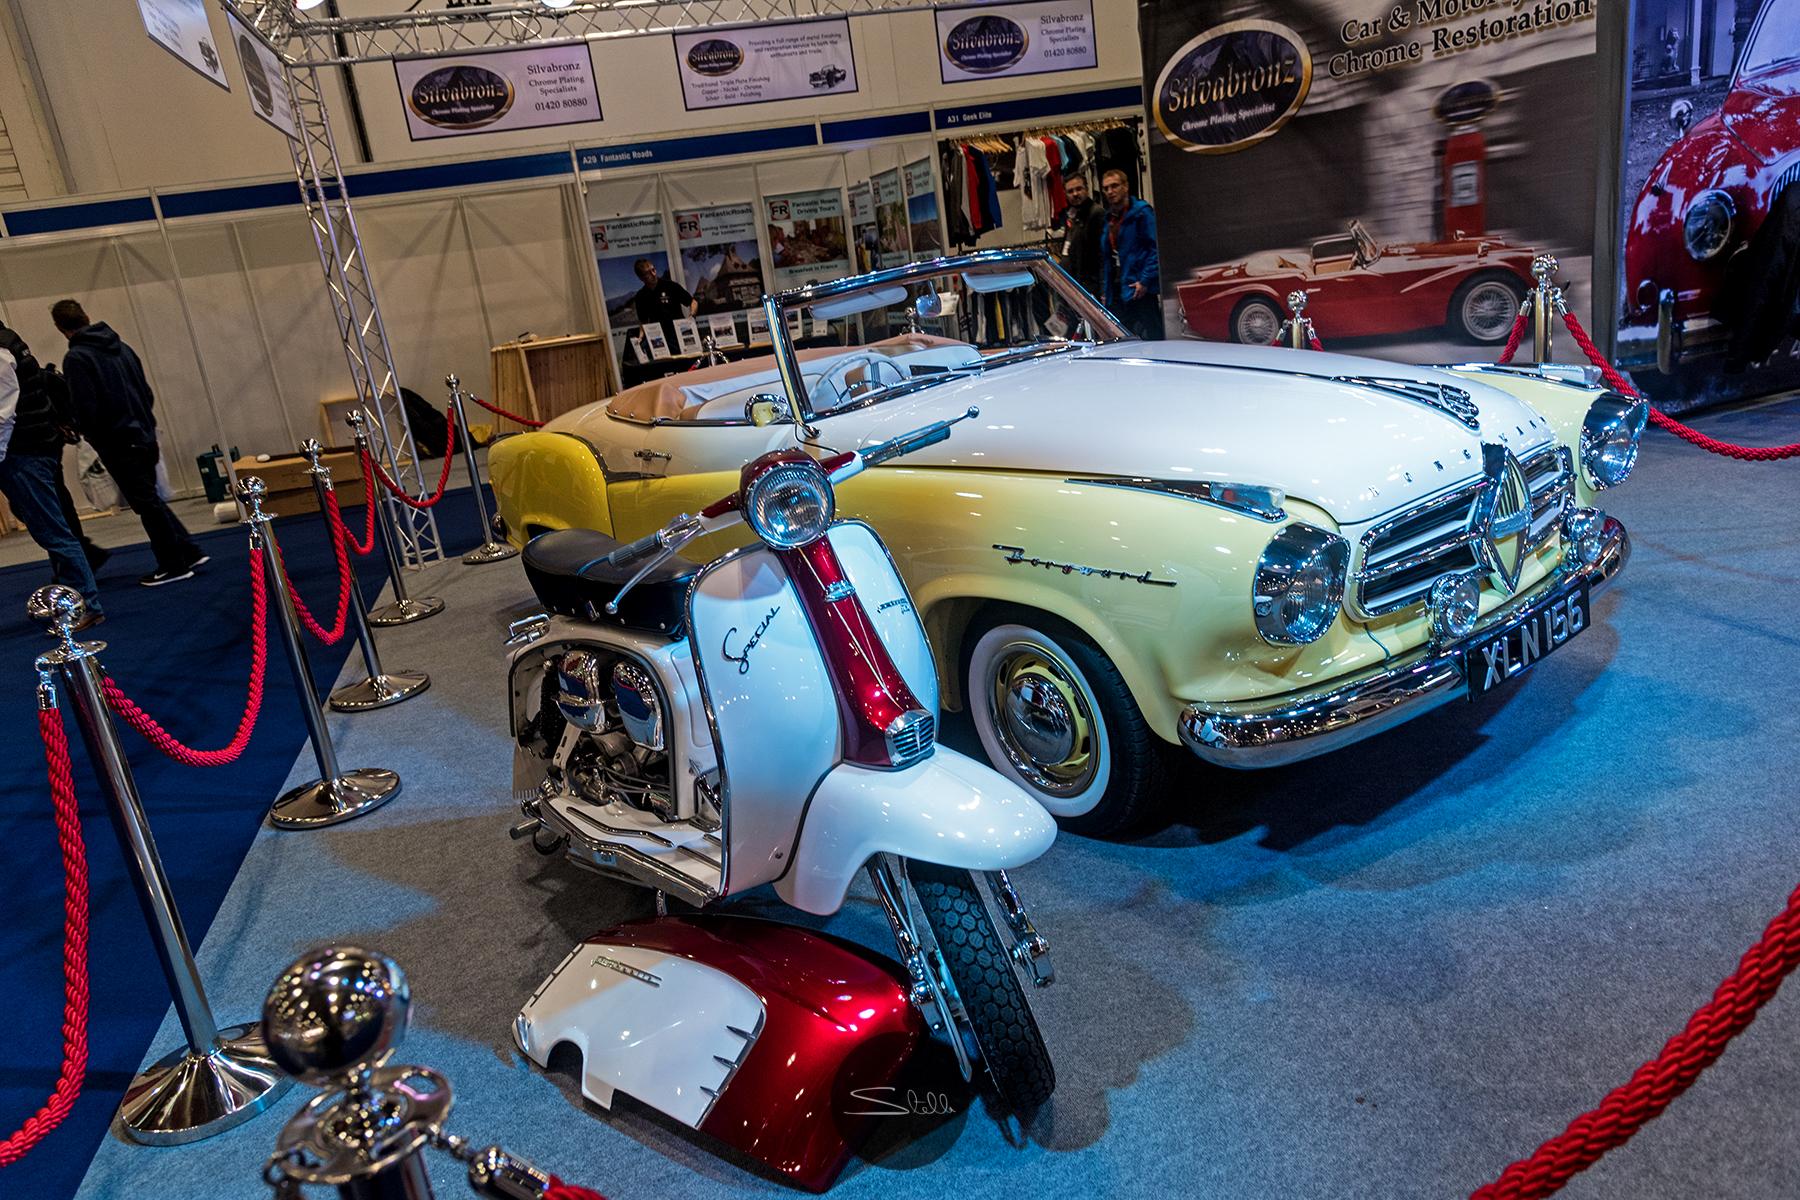 Stella Scordellis London Classic Car Show 2017 21 Watermarked.jpg